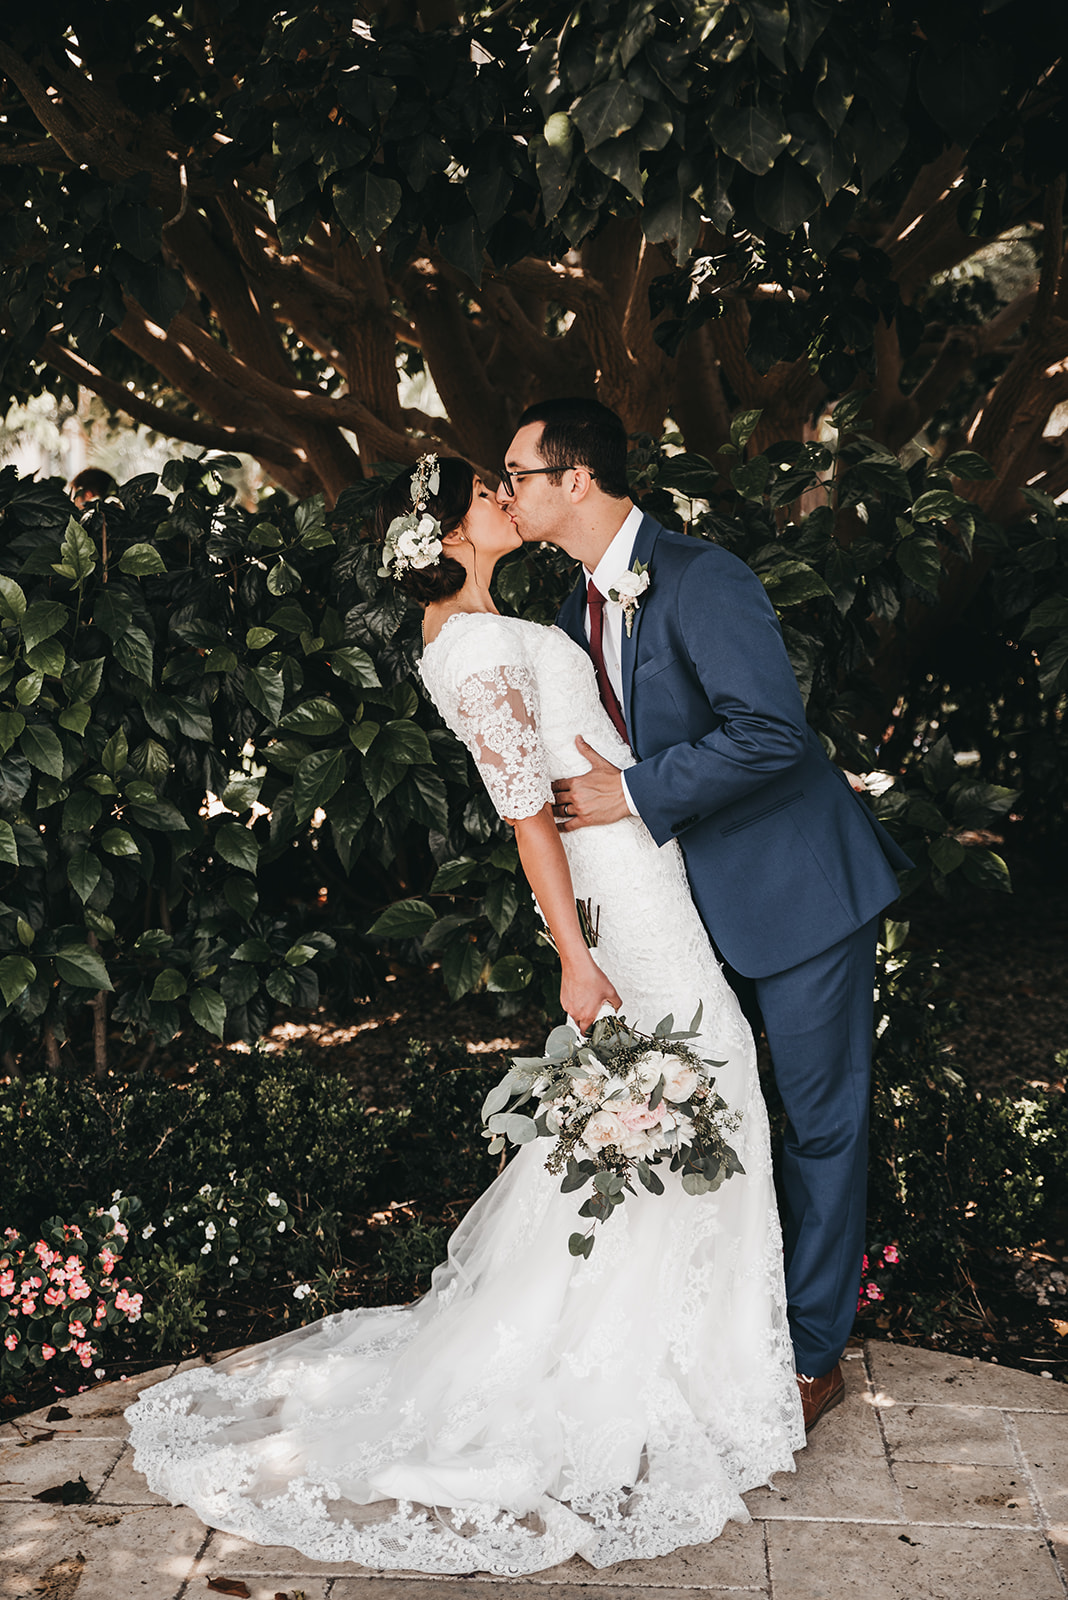 Tyler _ Kim Wedding Day 2018 print (253 of 455).jpg